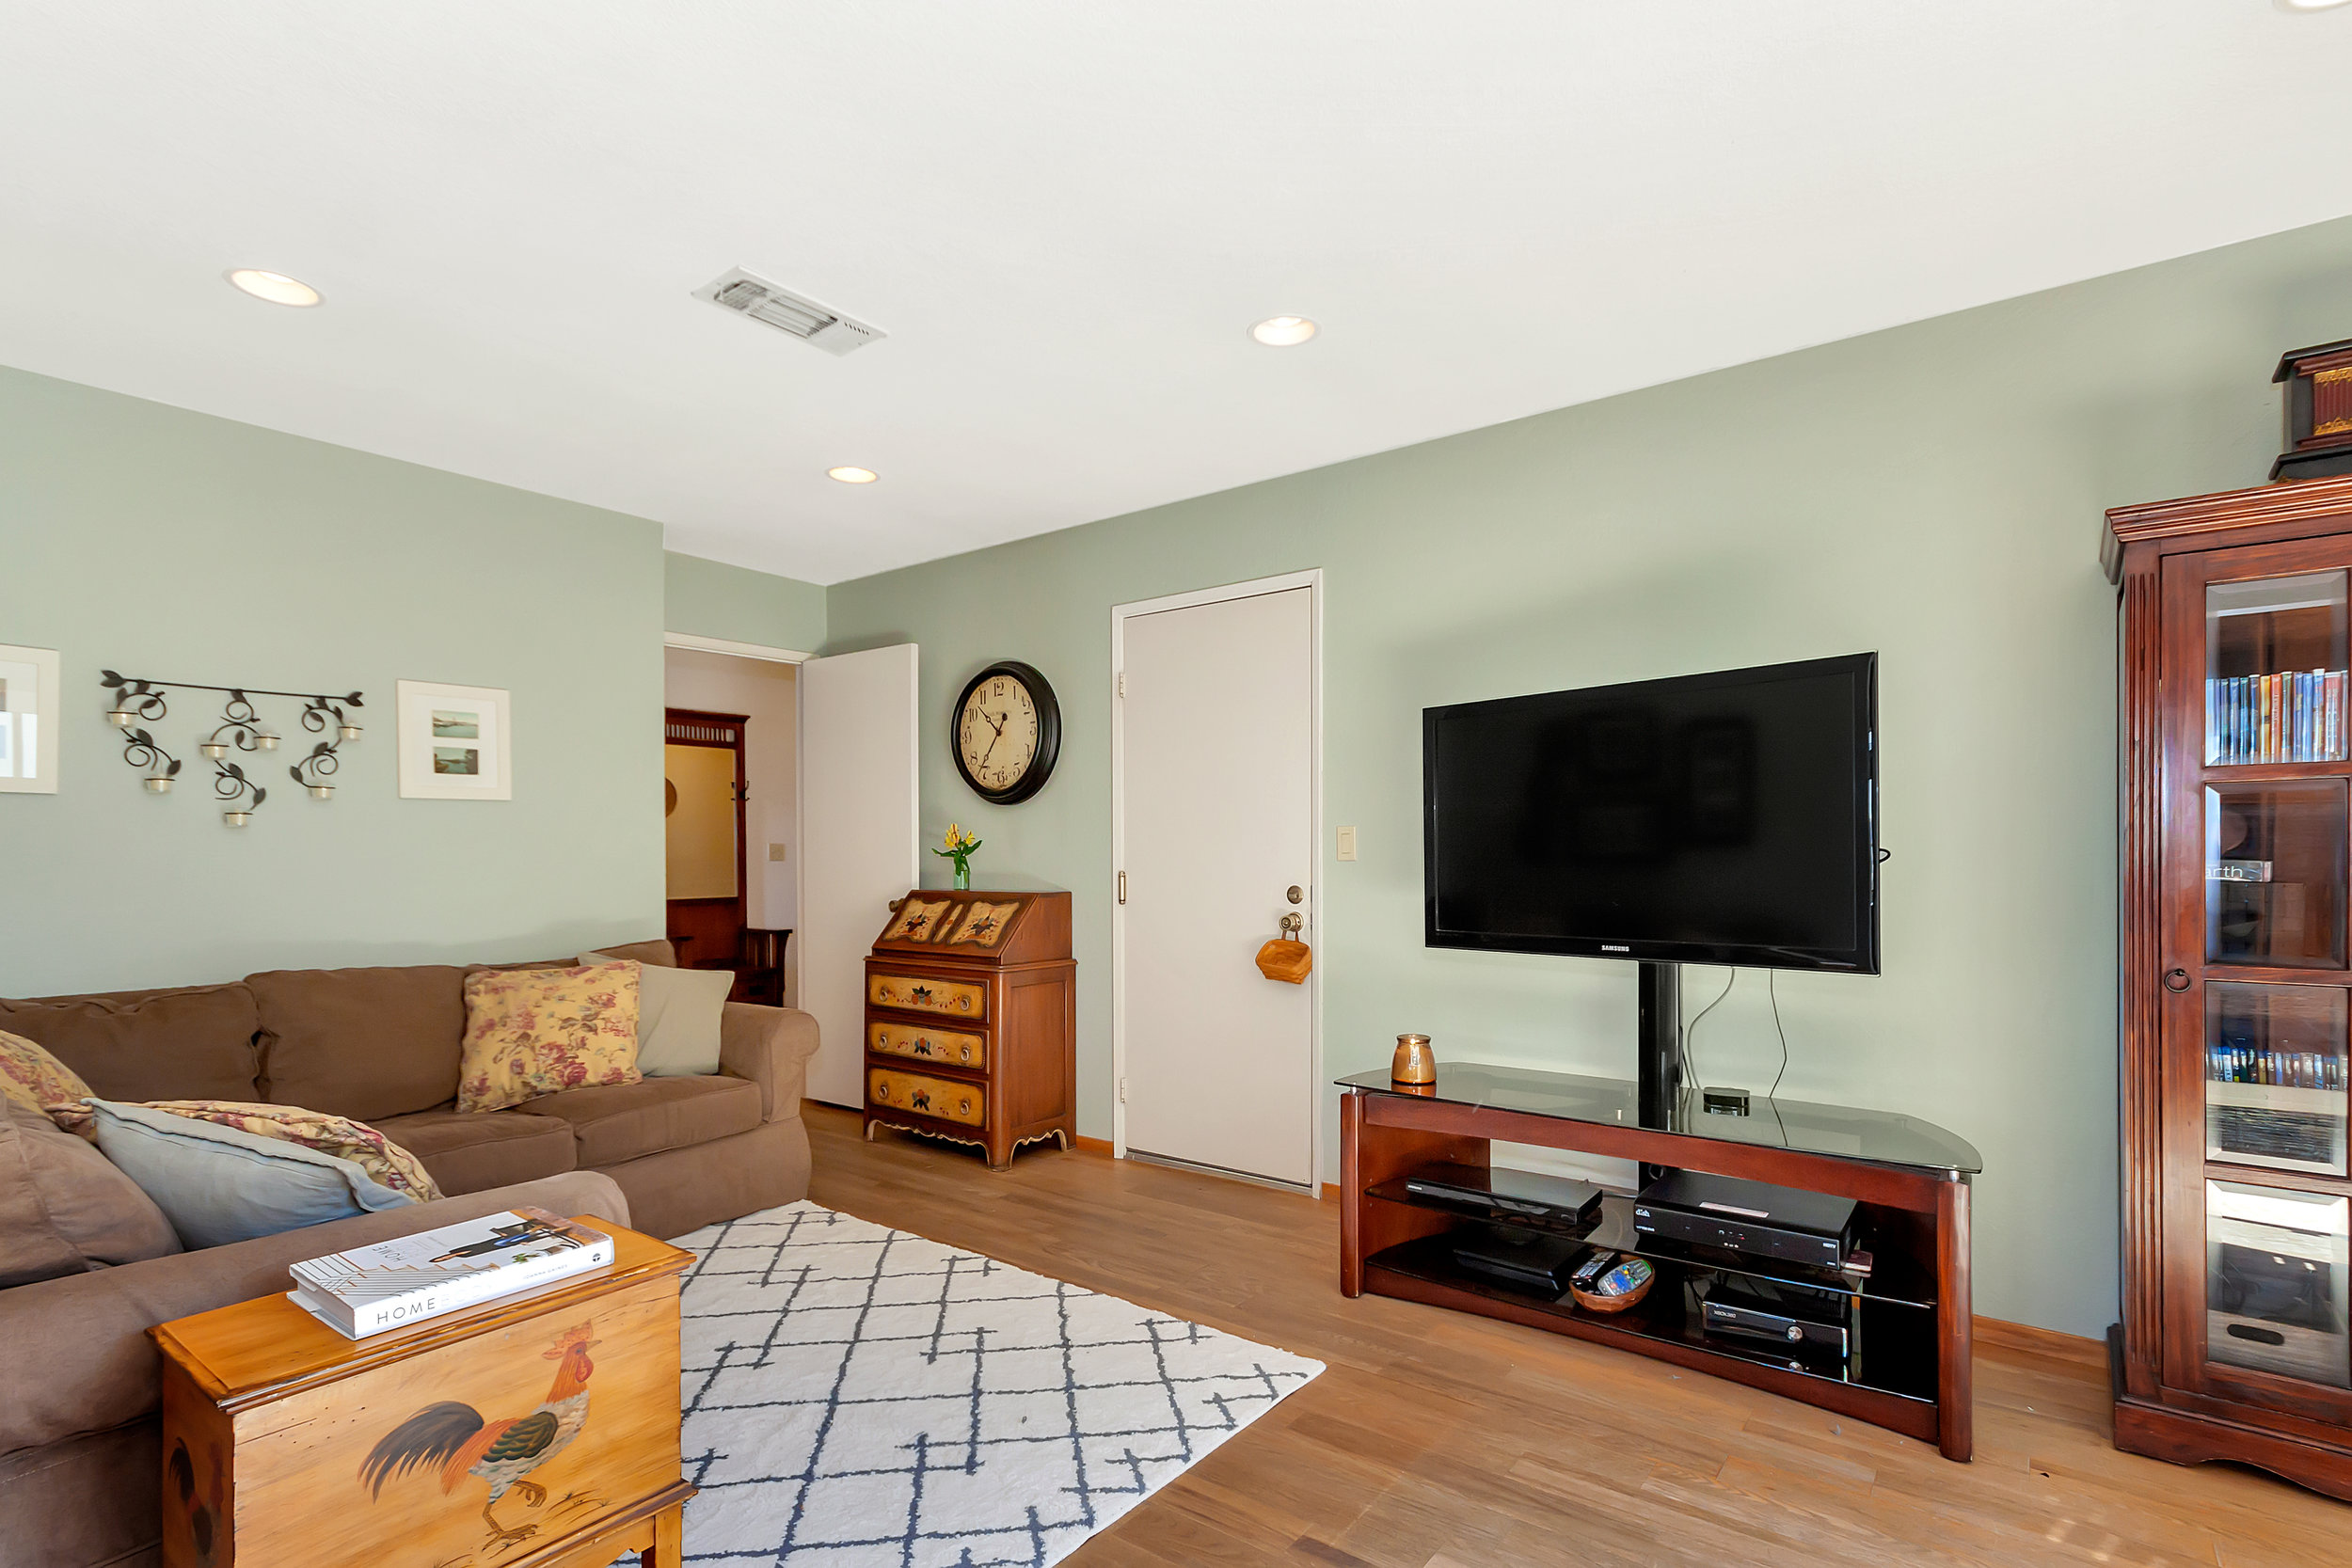 388 W Seaview Dr Benicia CA-print-011-004-Family Room 1-4200x2800-300dpi.jpg